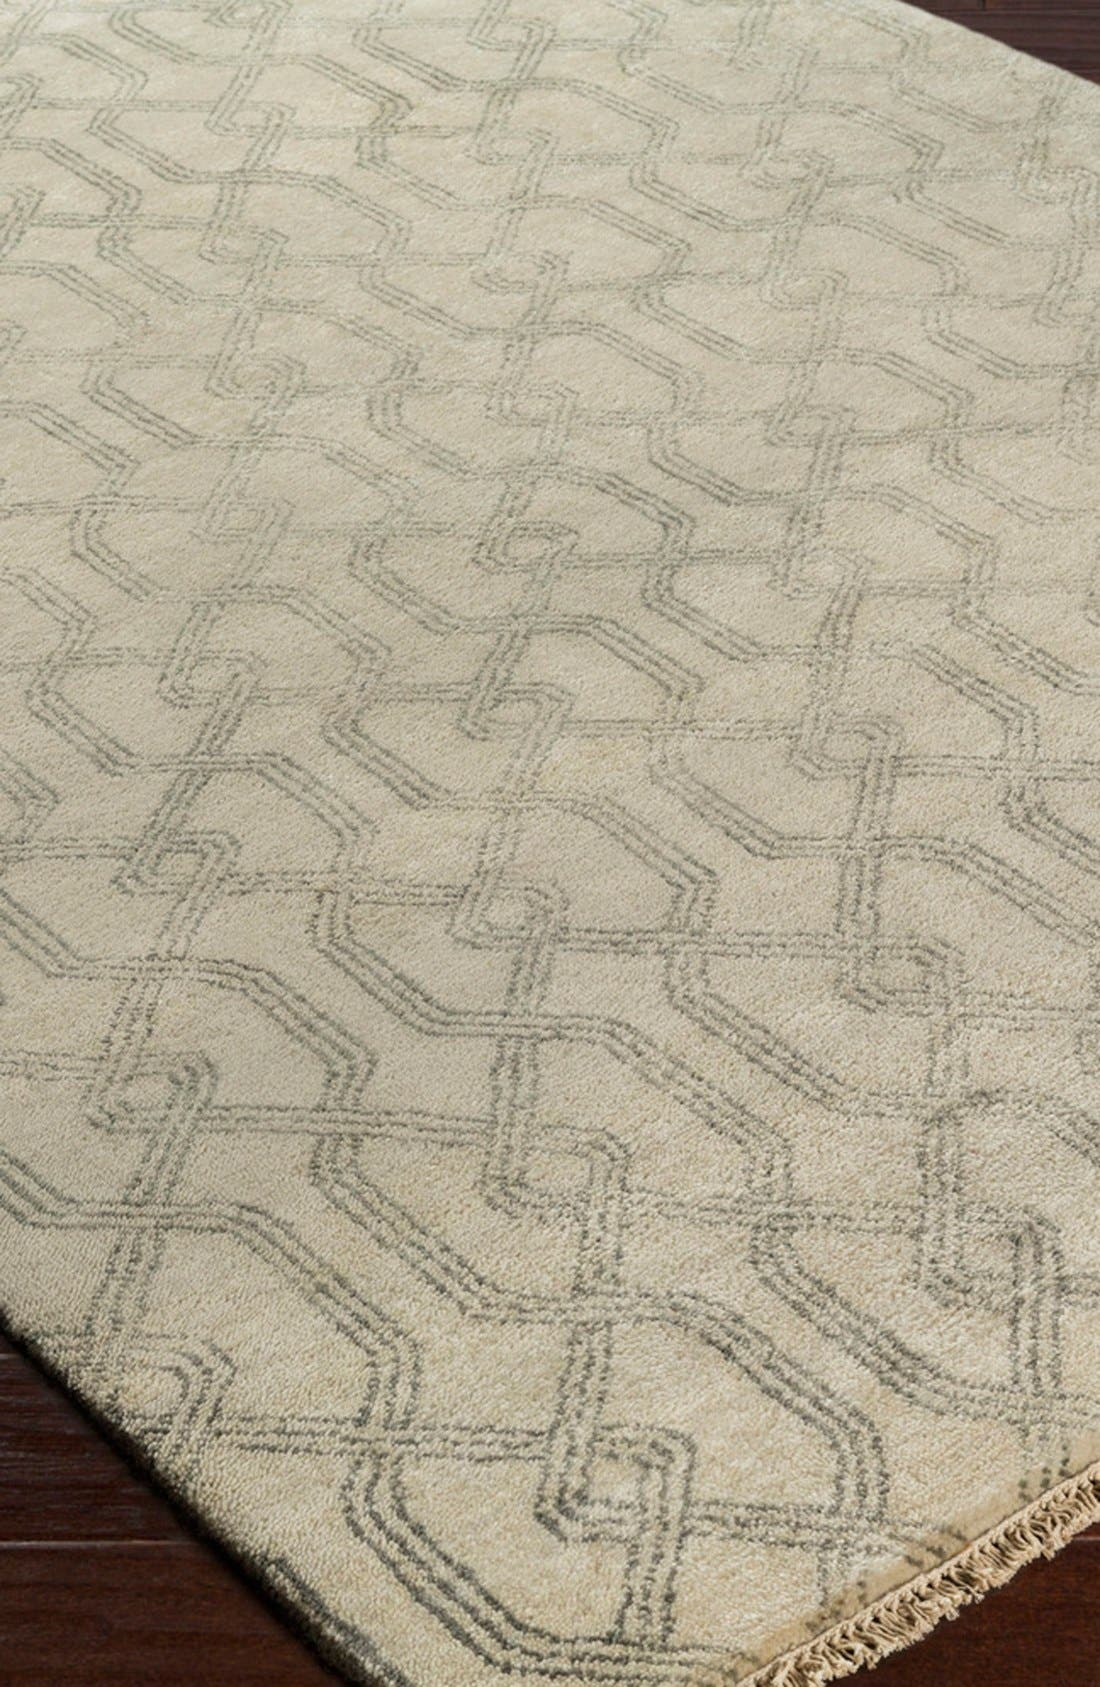 'Stanton' Wool & Cotton Rug,                             Alternate thumbnail 3, color,                             020